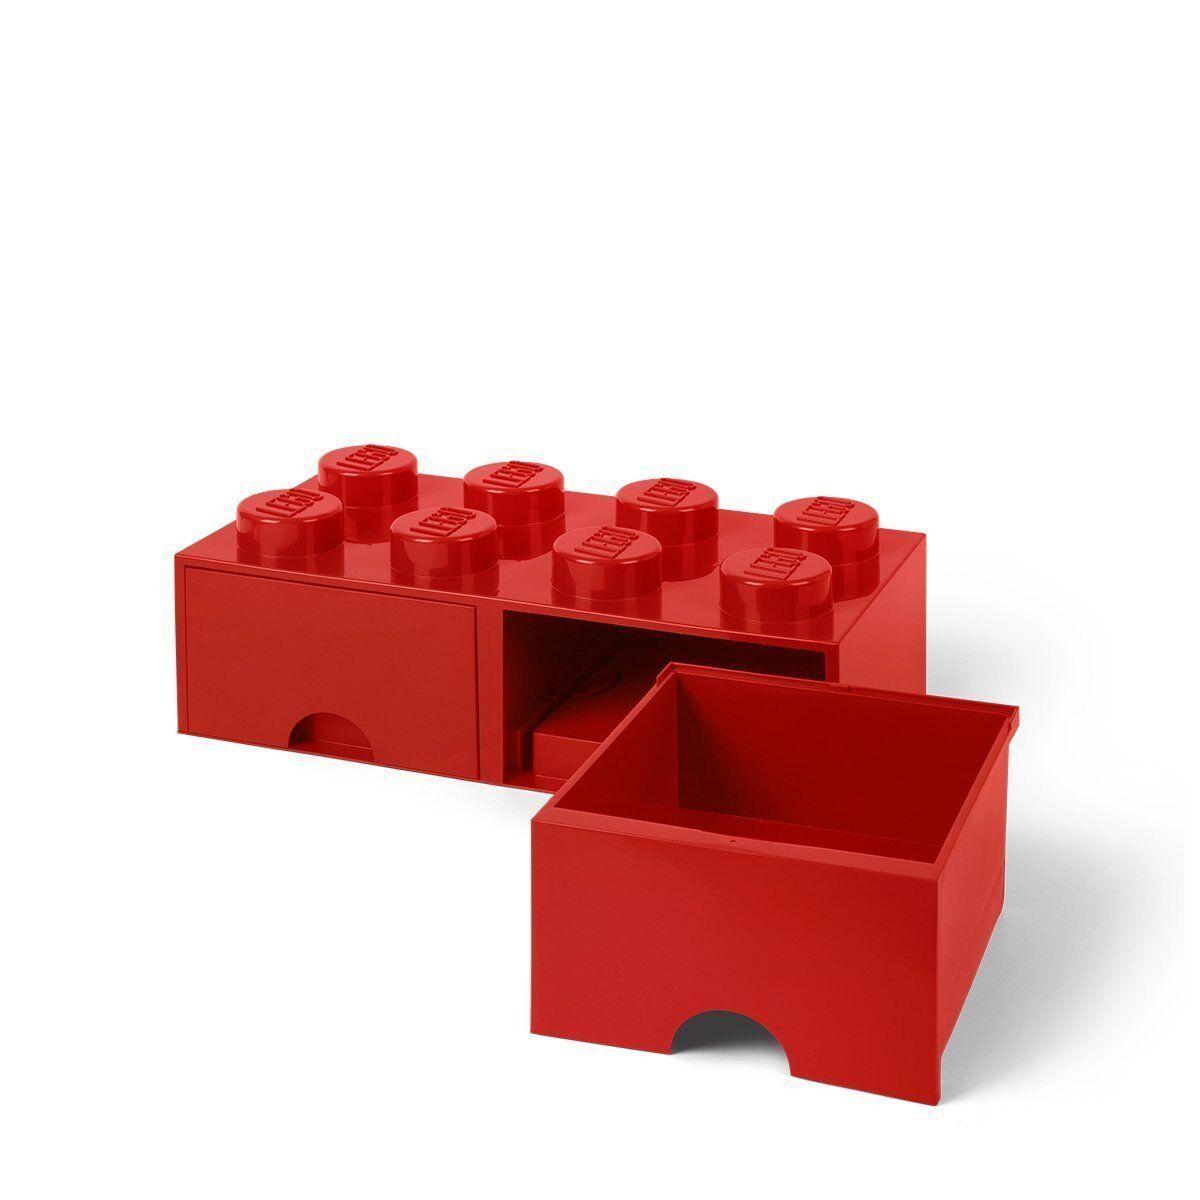 Lego 40061730. Ladrillo Lego Gigante Rojo. Contenedor almacenaje con 2 cajones